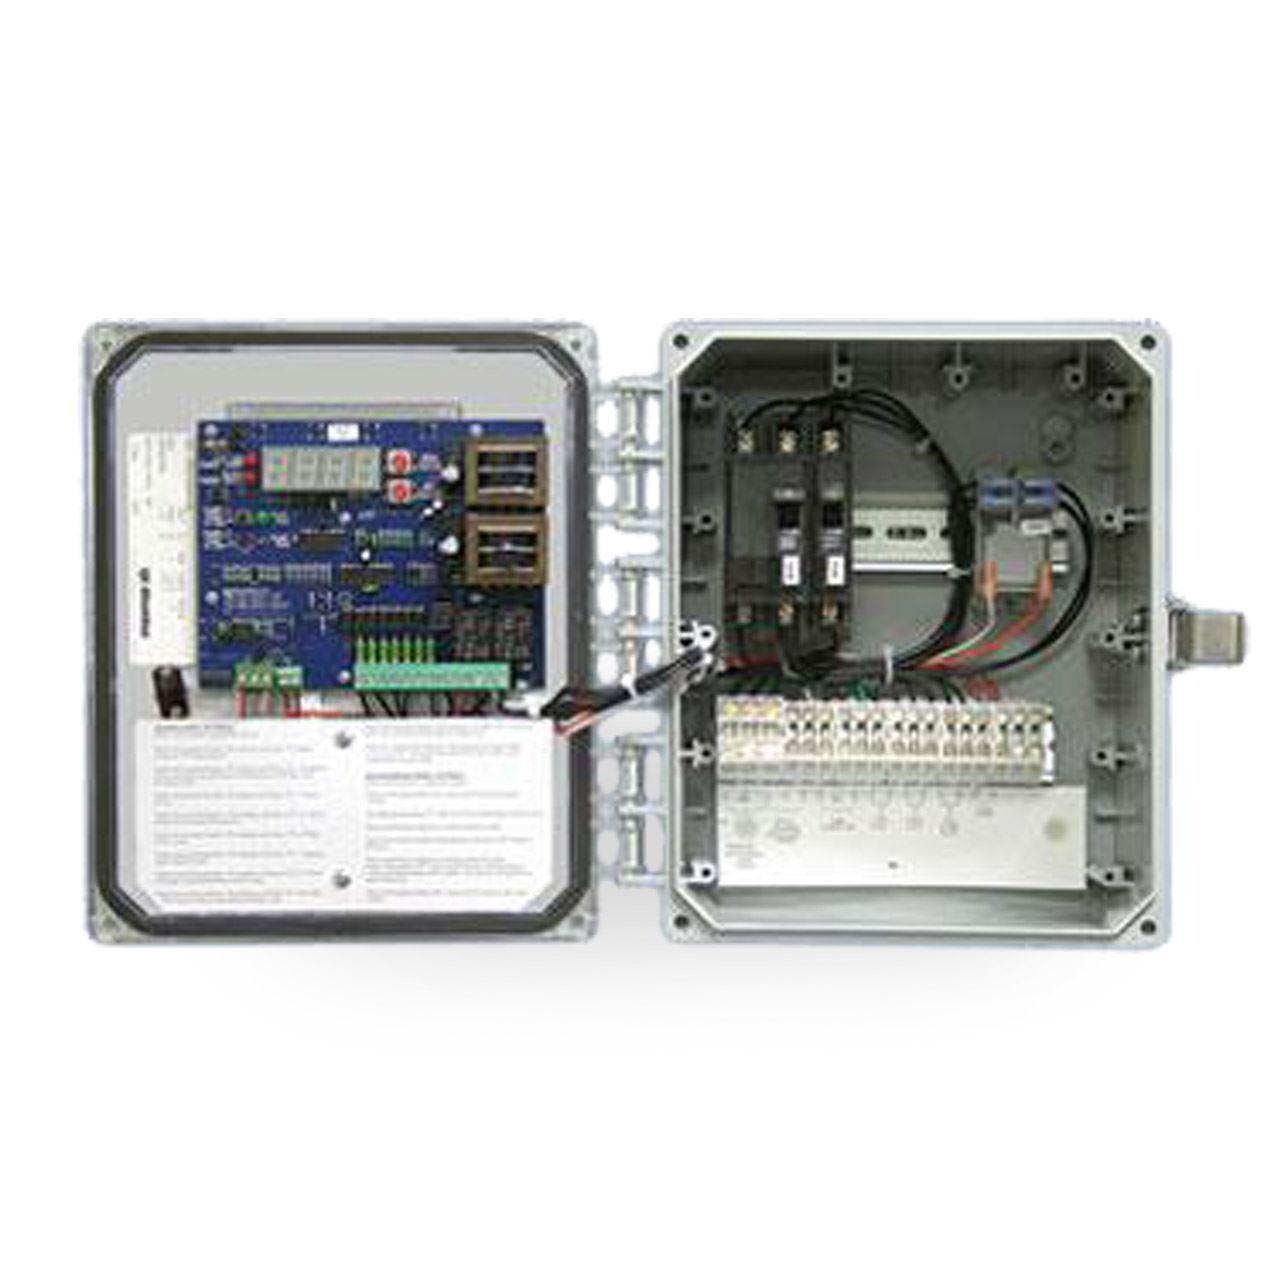 Proline Gp 870xii Wiring Diagram 32 Images Liberty Pump Ez Series W Zoeller U2022 45 63 74 91 At